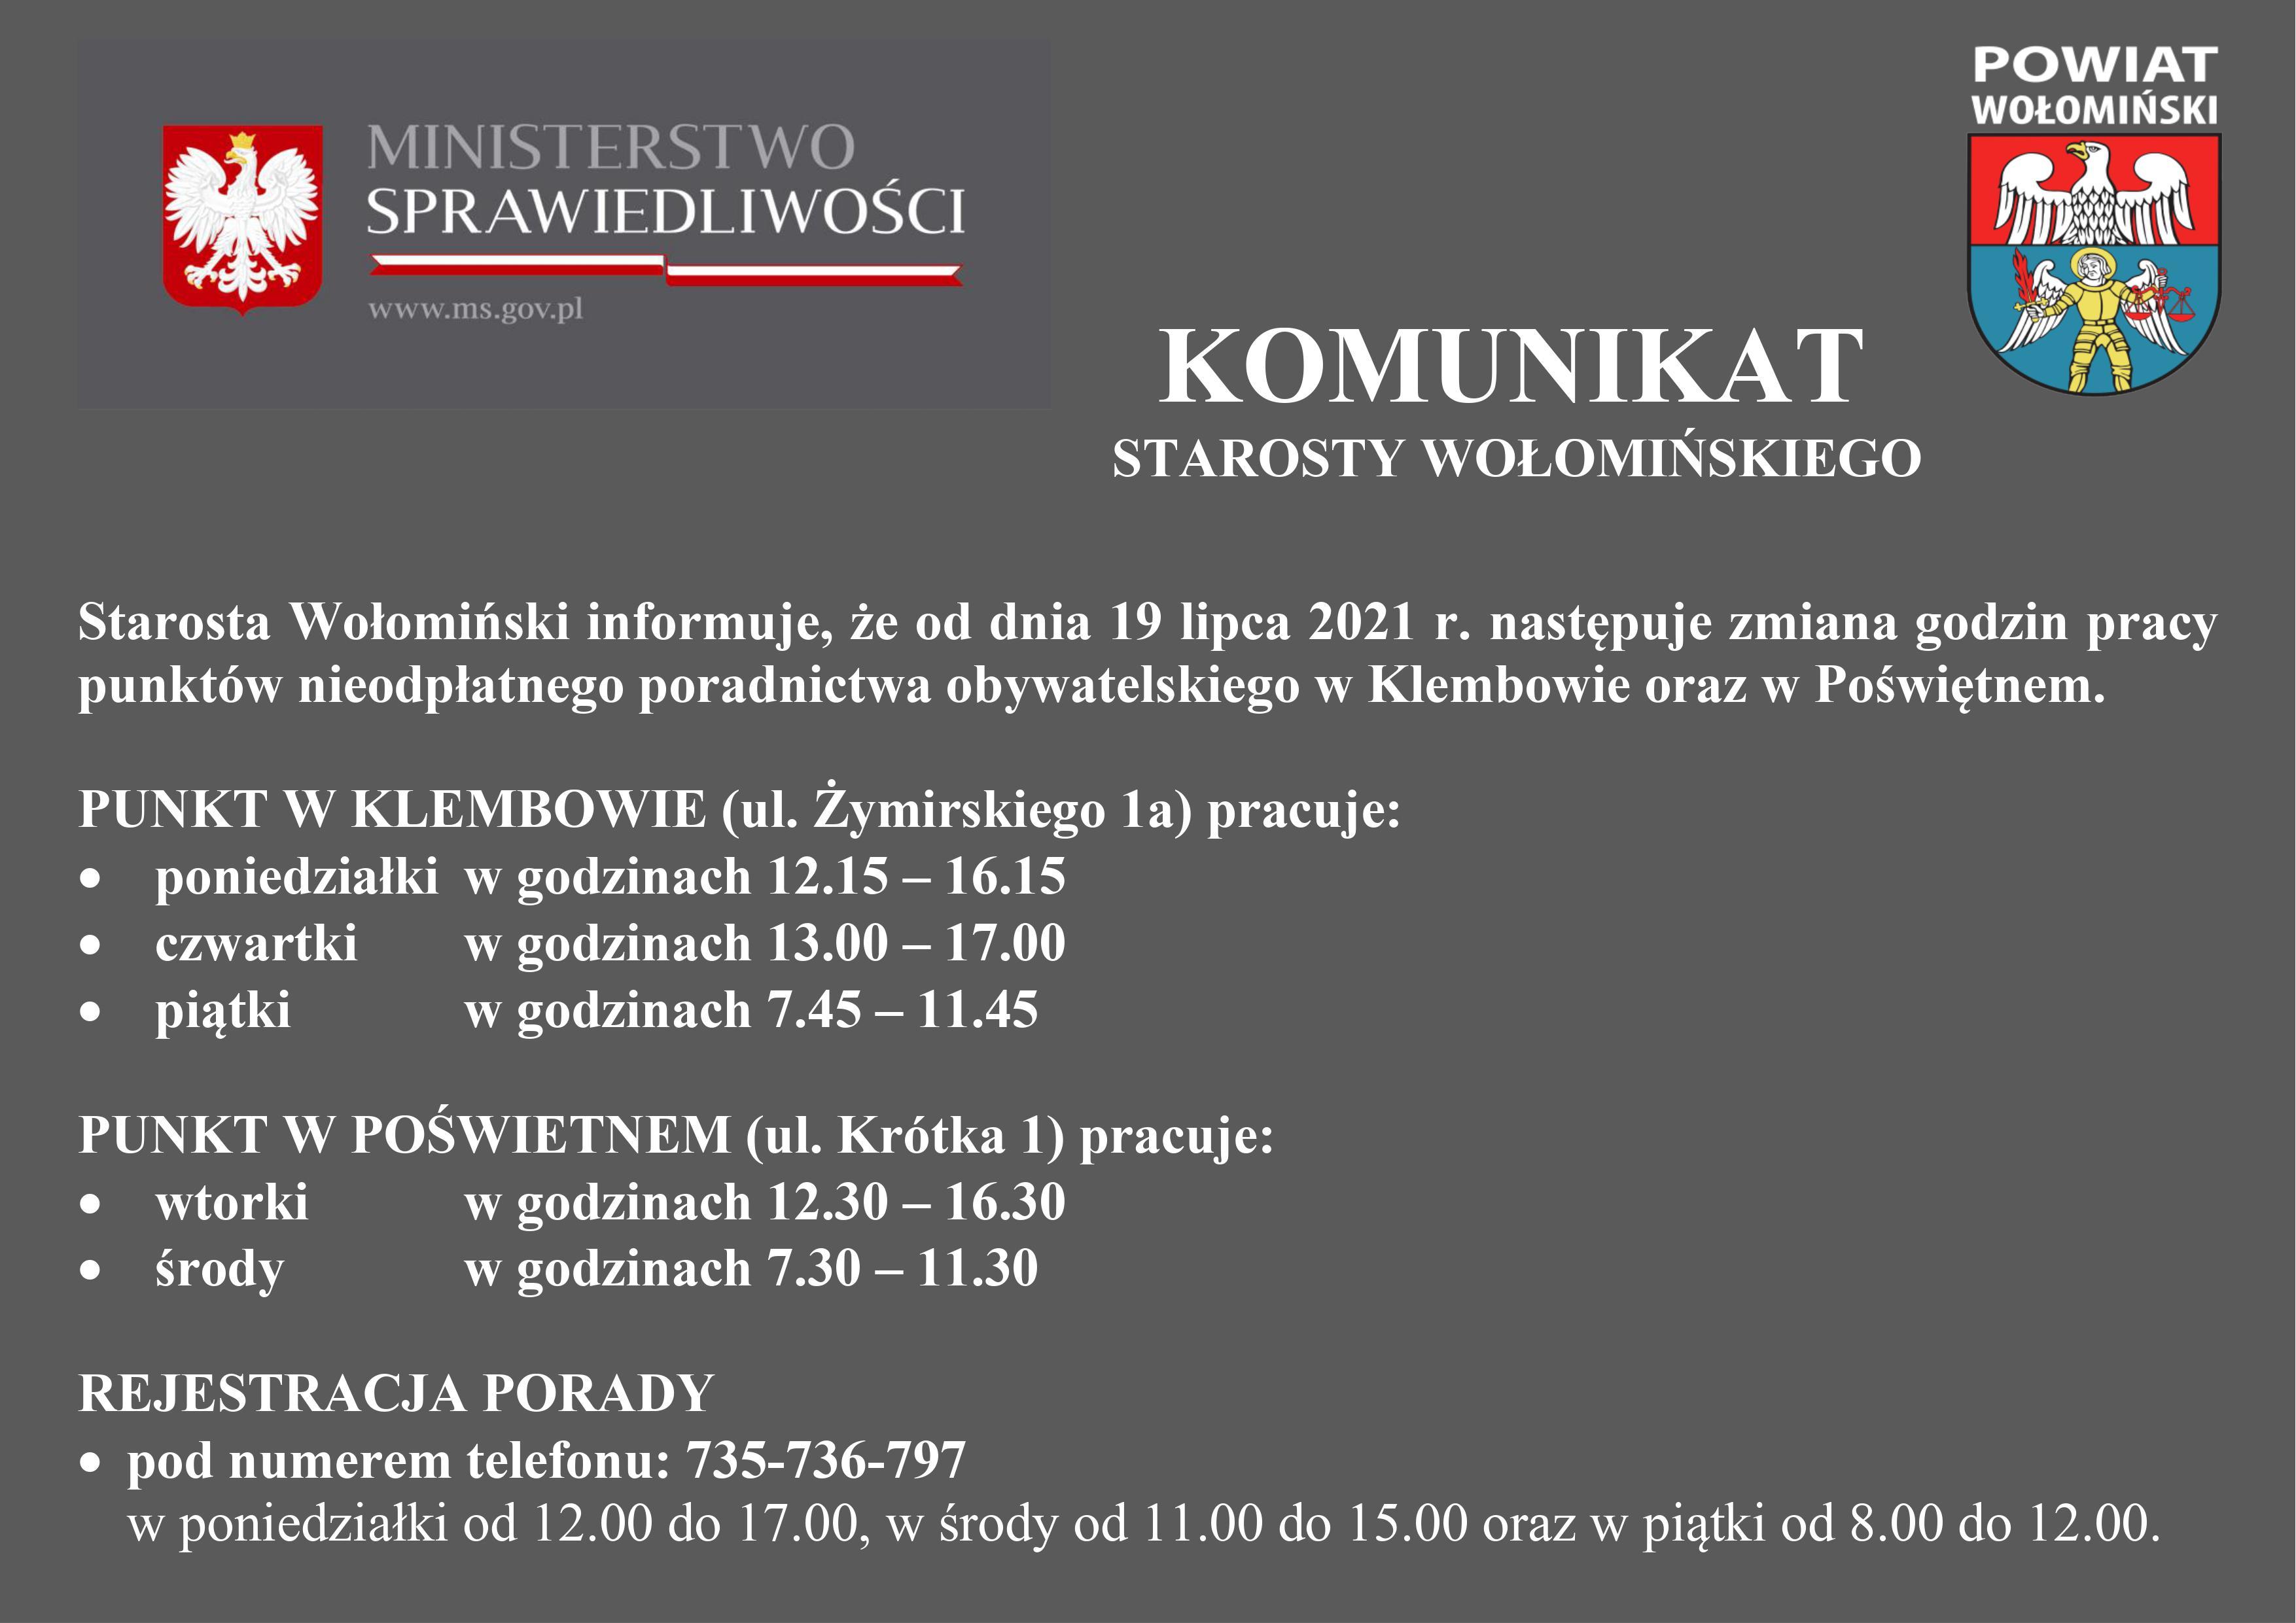 https://redakcja.samorzad.gov.pl/photo/9f2d7ec3-ec7a-4667-8eb2-c7a44c98b992